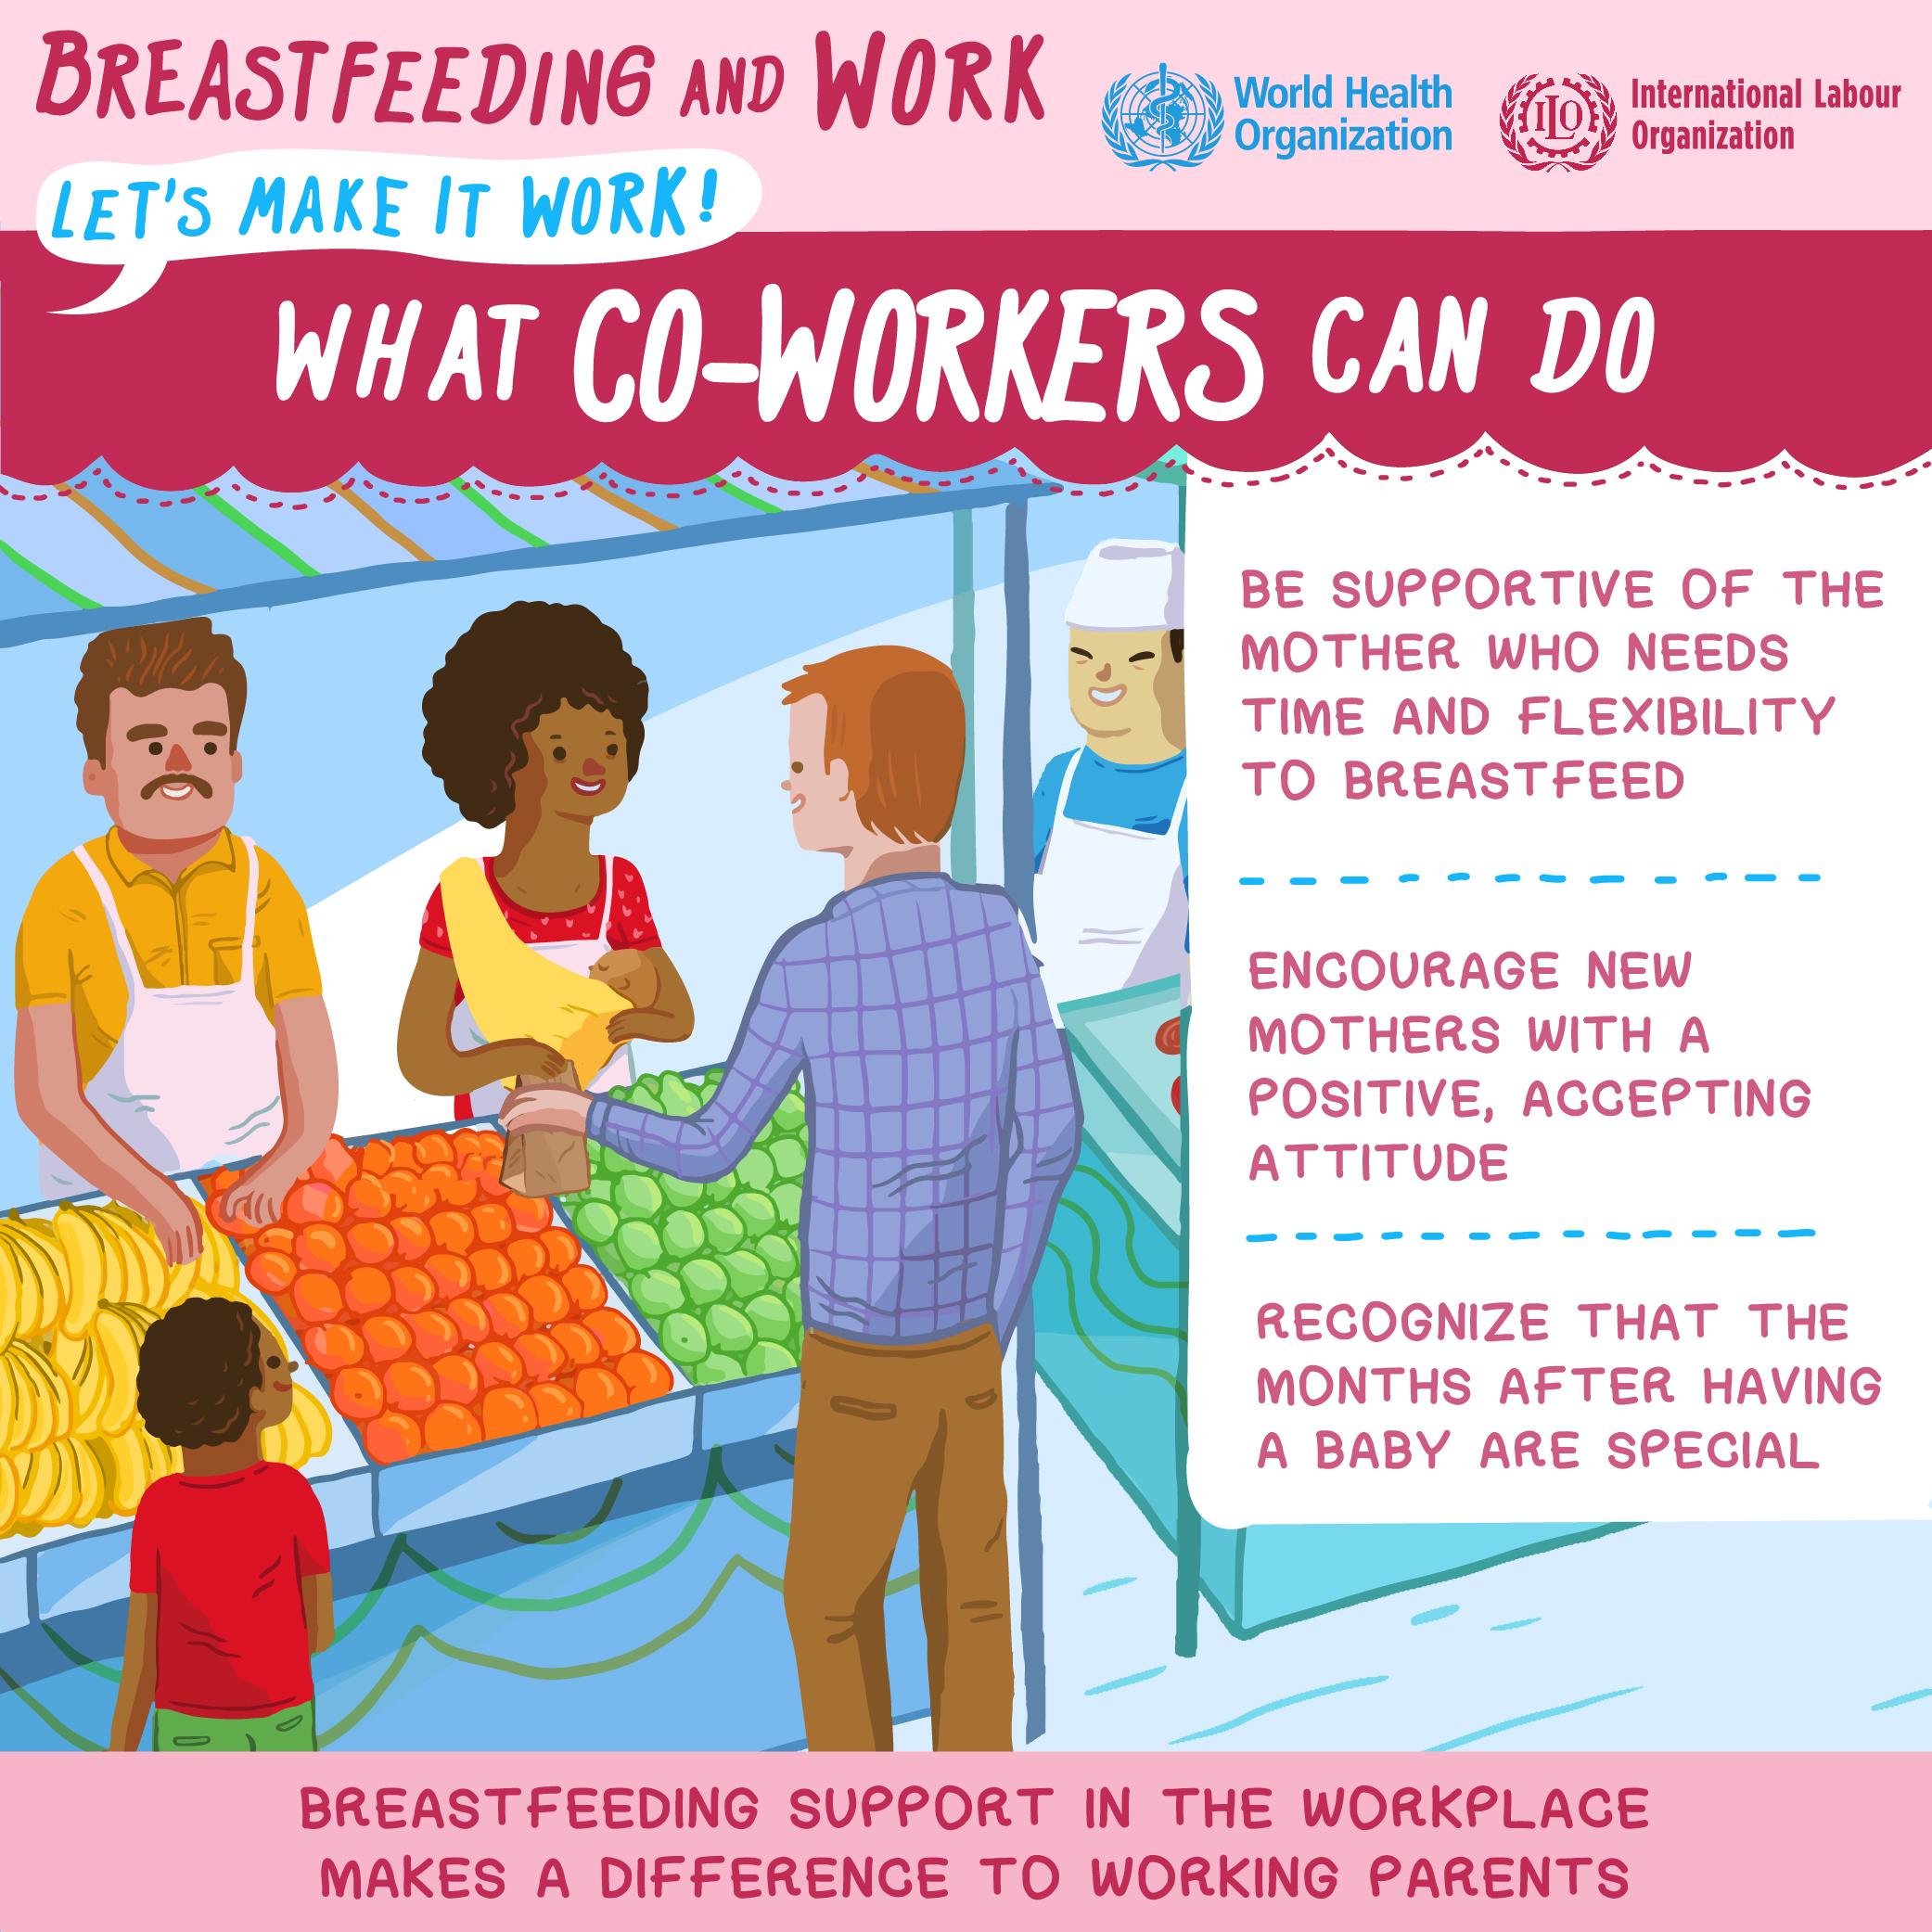 WHO_BreastfeedingWeek2015_EN-2.jpg